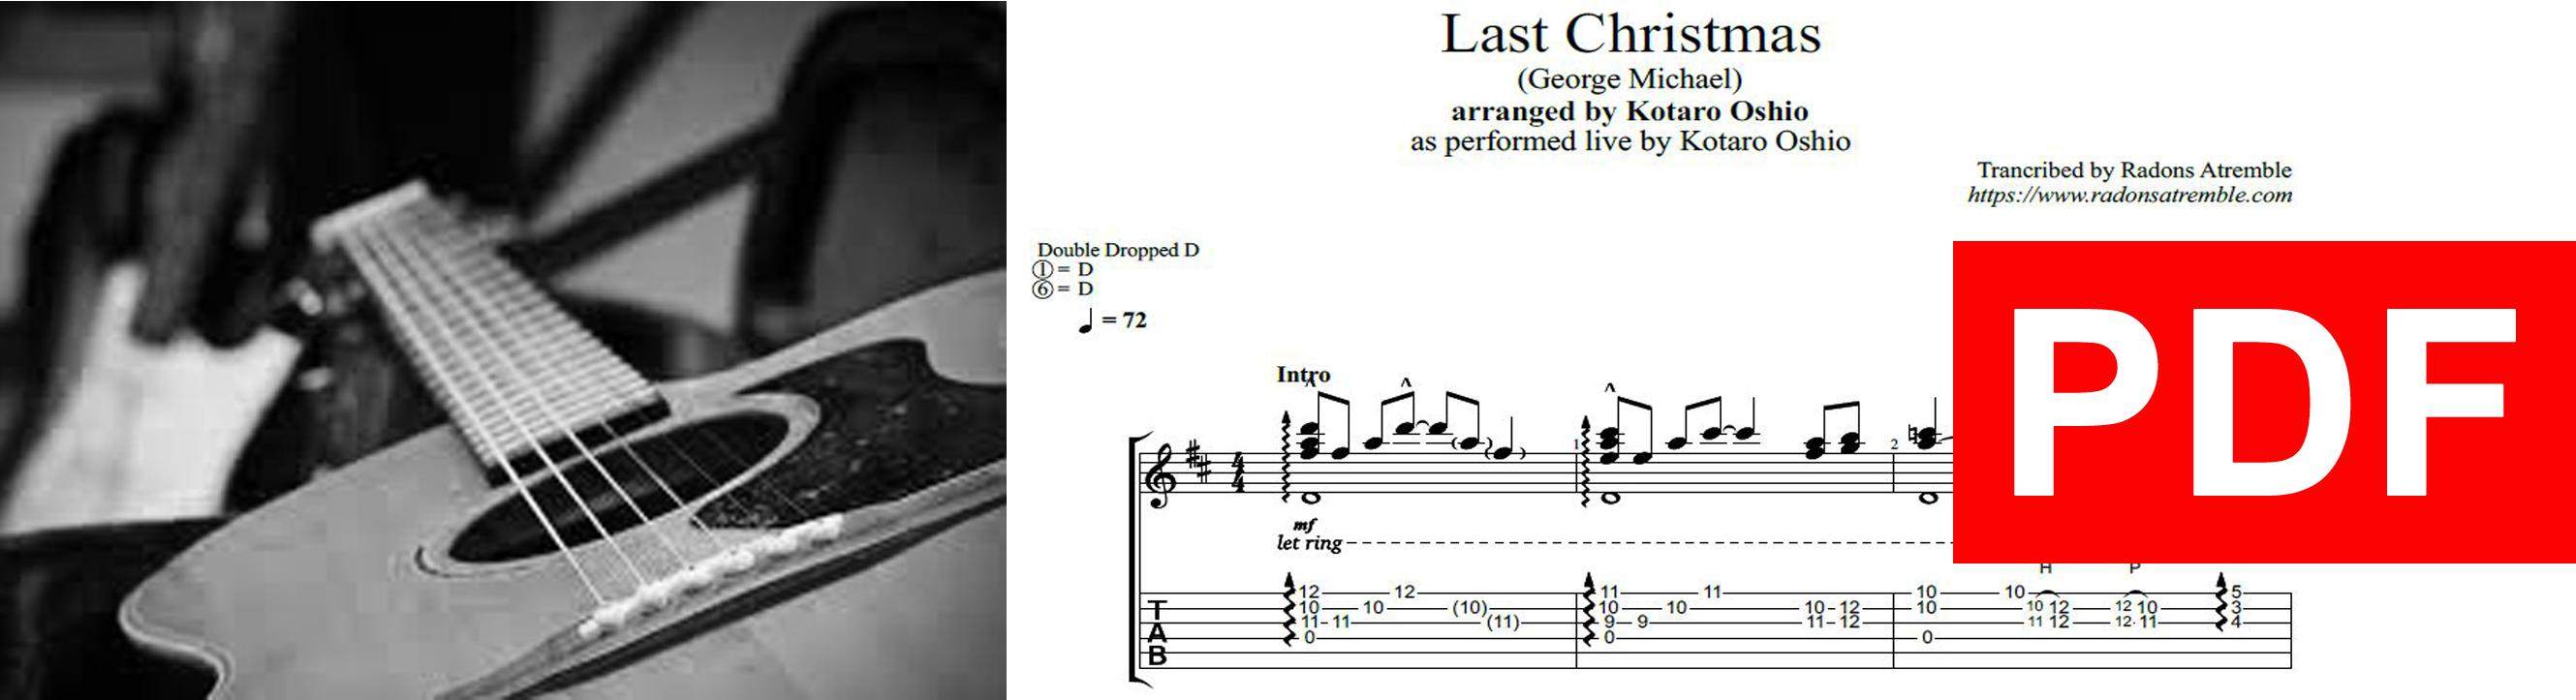 009 Last Christmas - Kotaro Oshio PDF Image